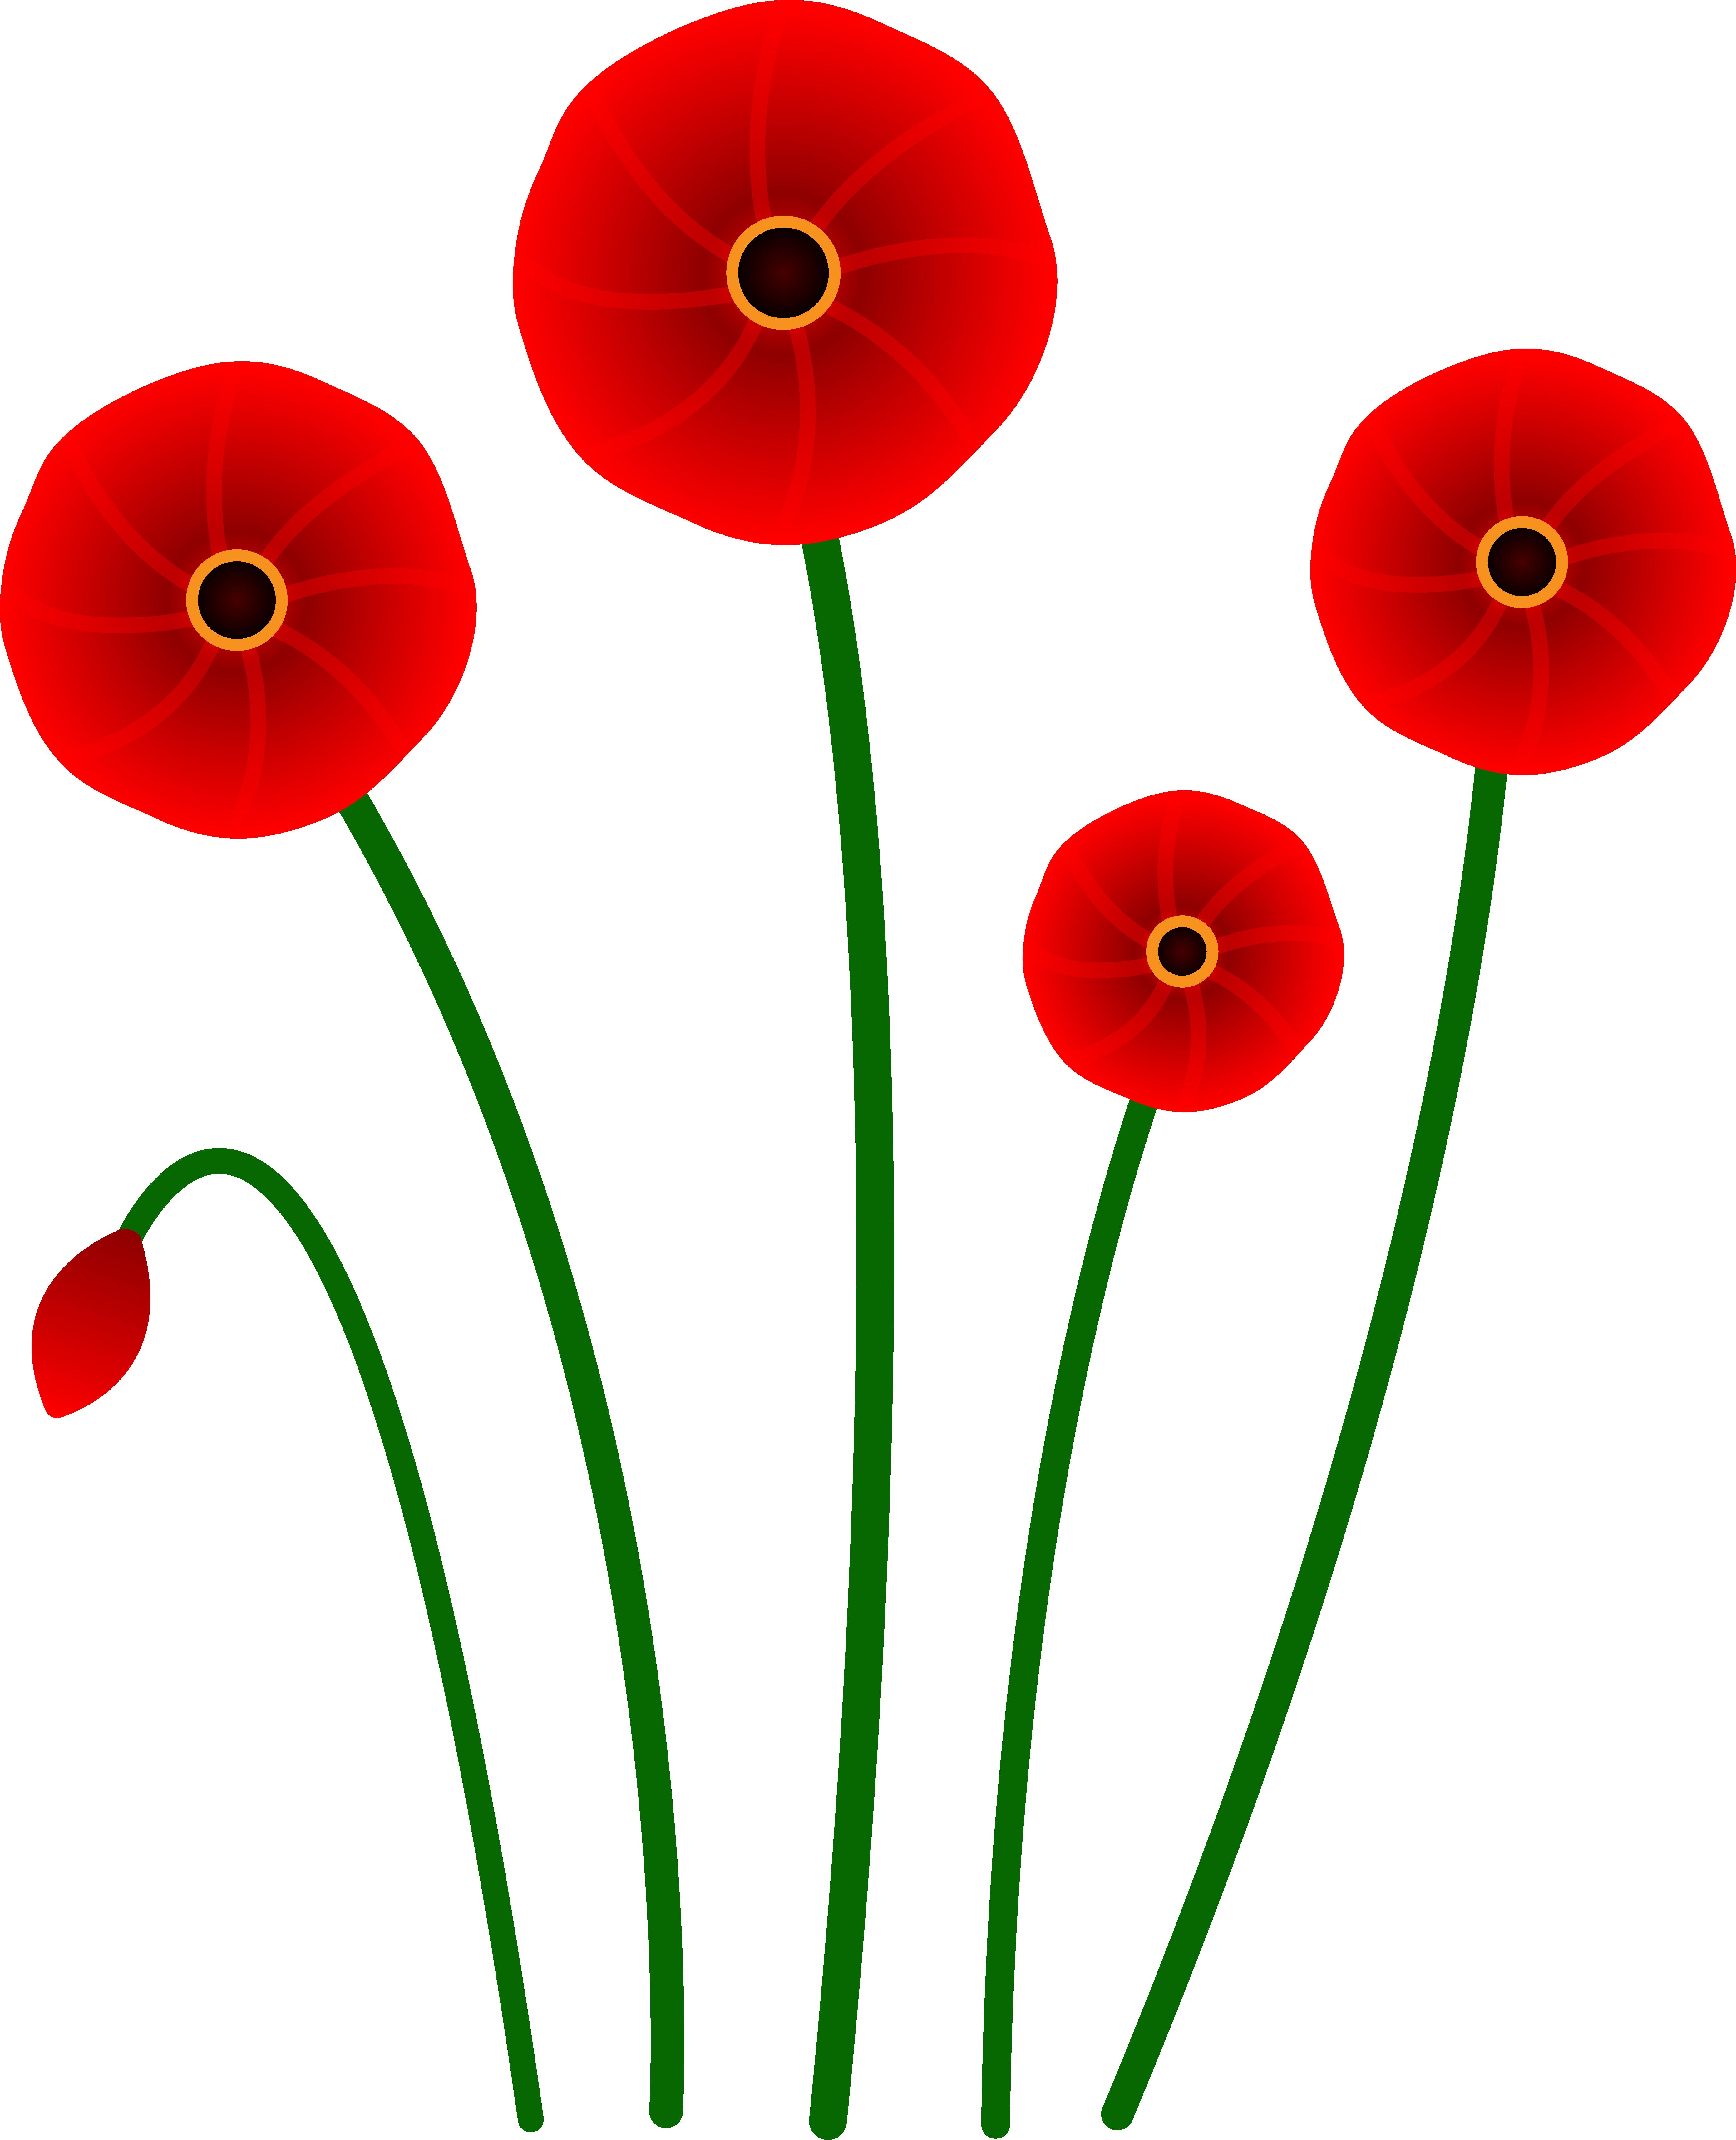 Free Poppy Cliparts, Download Free Clip Art, Free Clip Art.